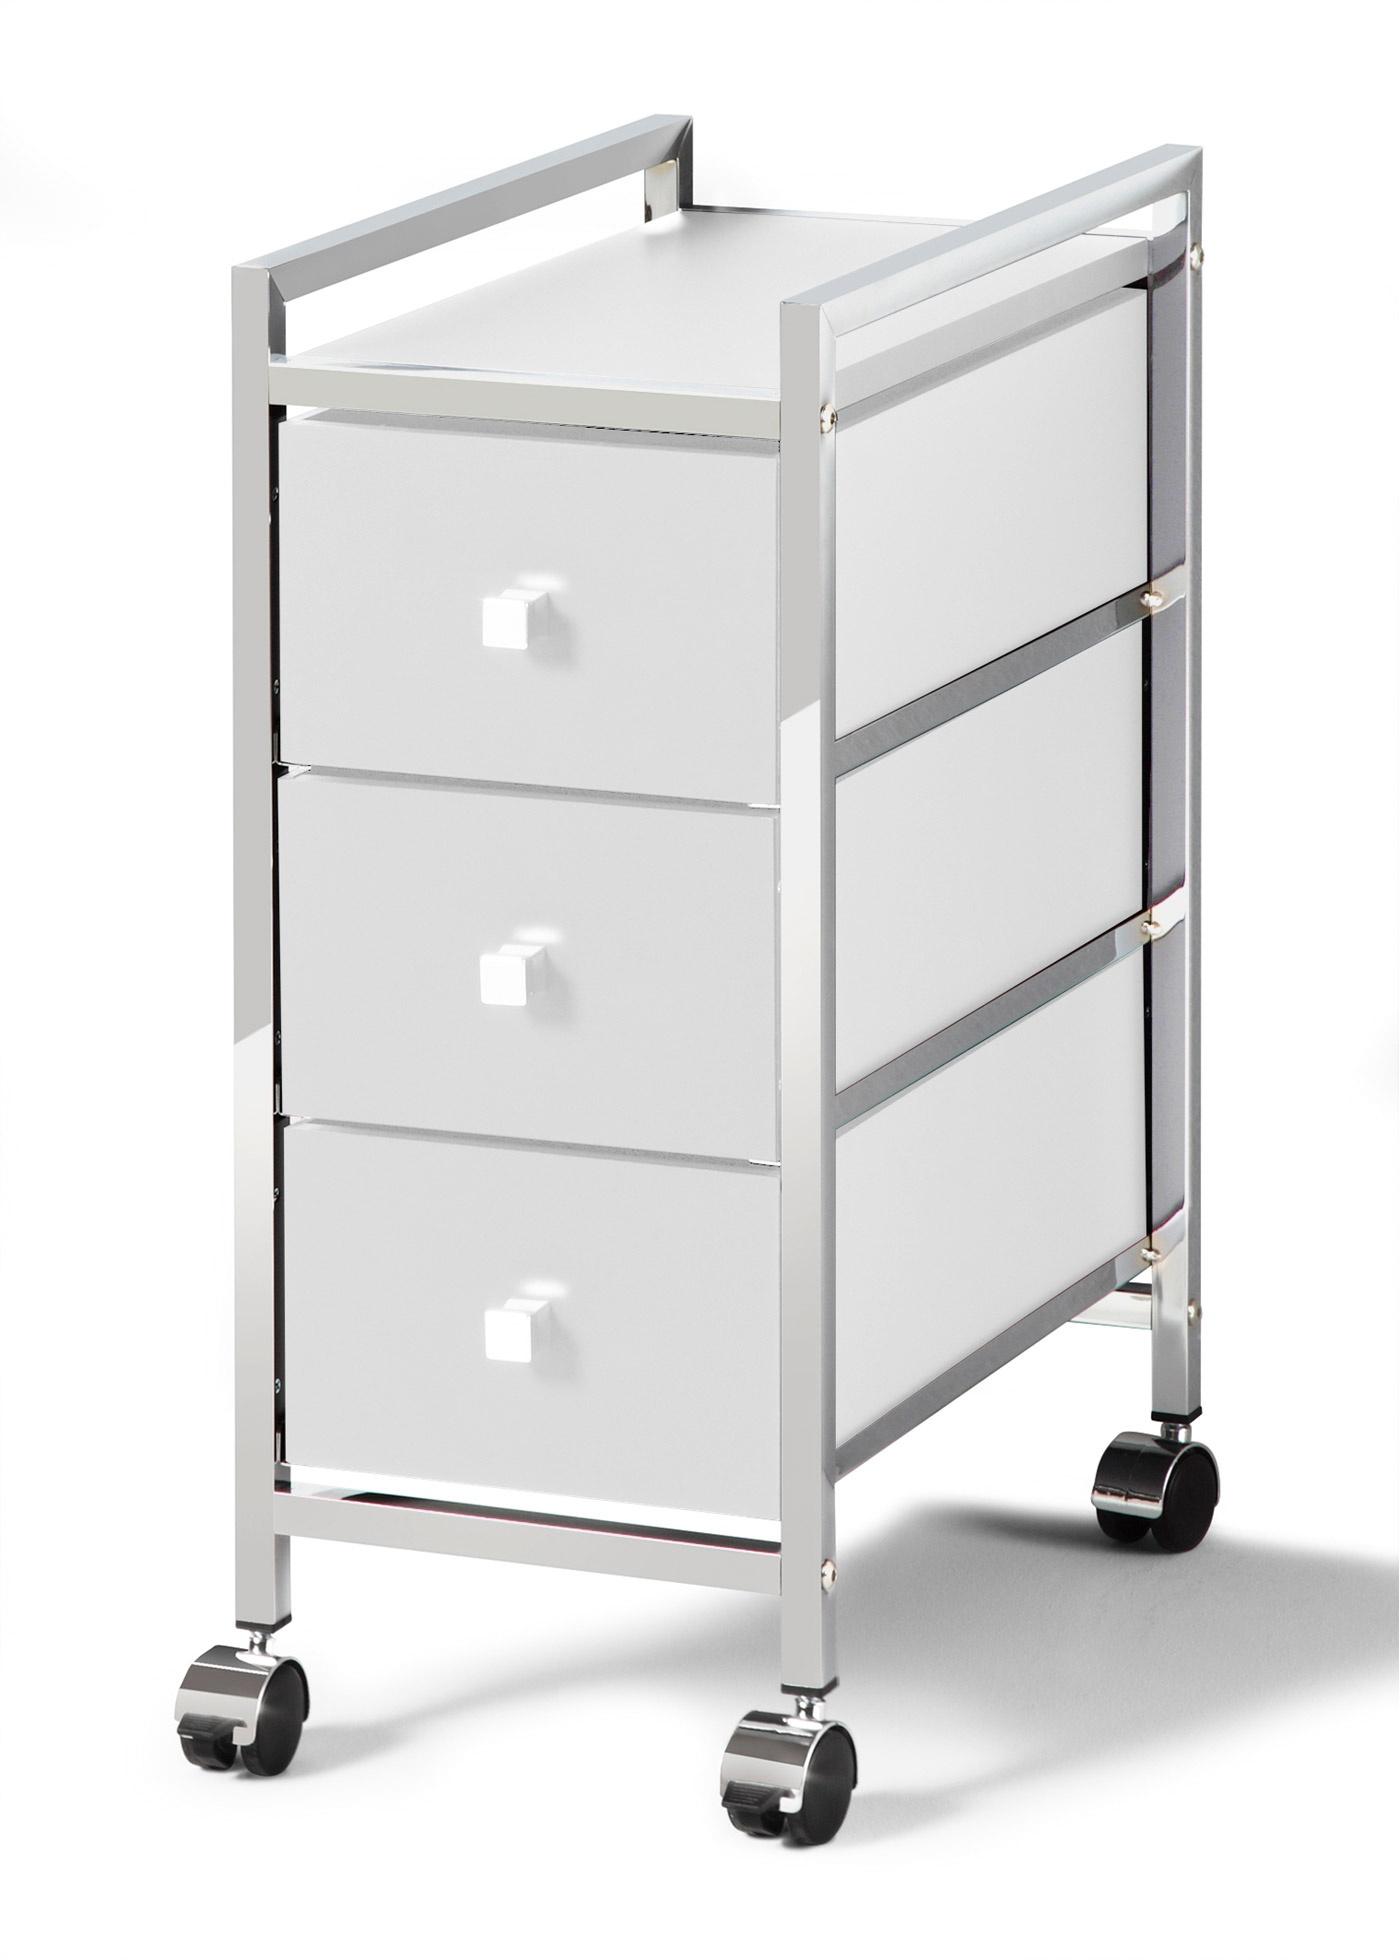 bad rollwagen sonstige preisvergleiche. Black Bedroom Furniture Sets. Home Design Ideas